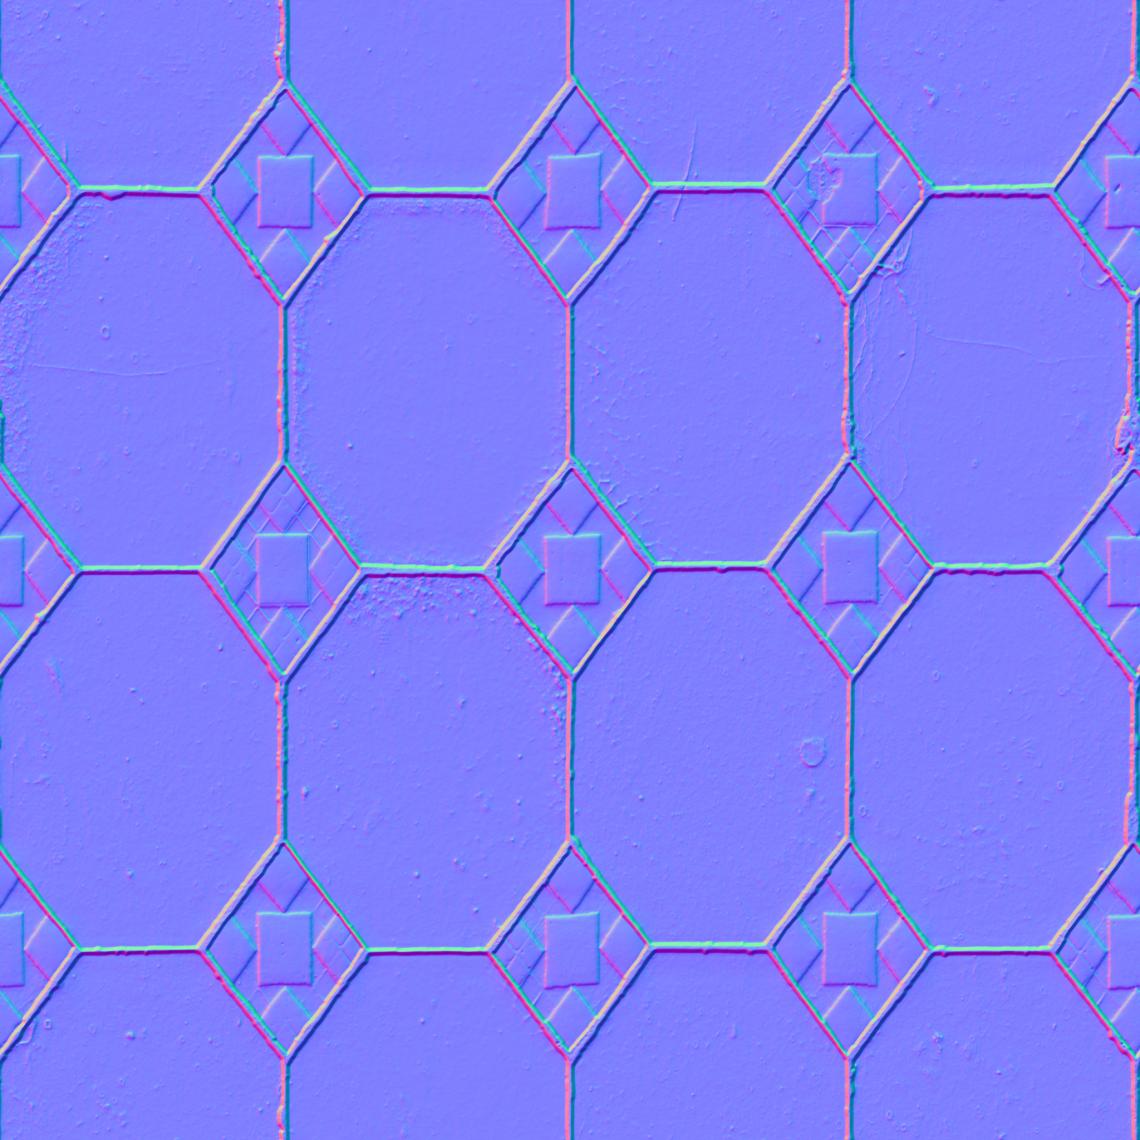 Ornate-Tiles-02-Normal - Seamless